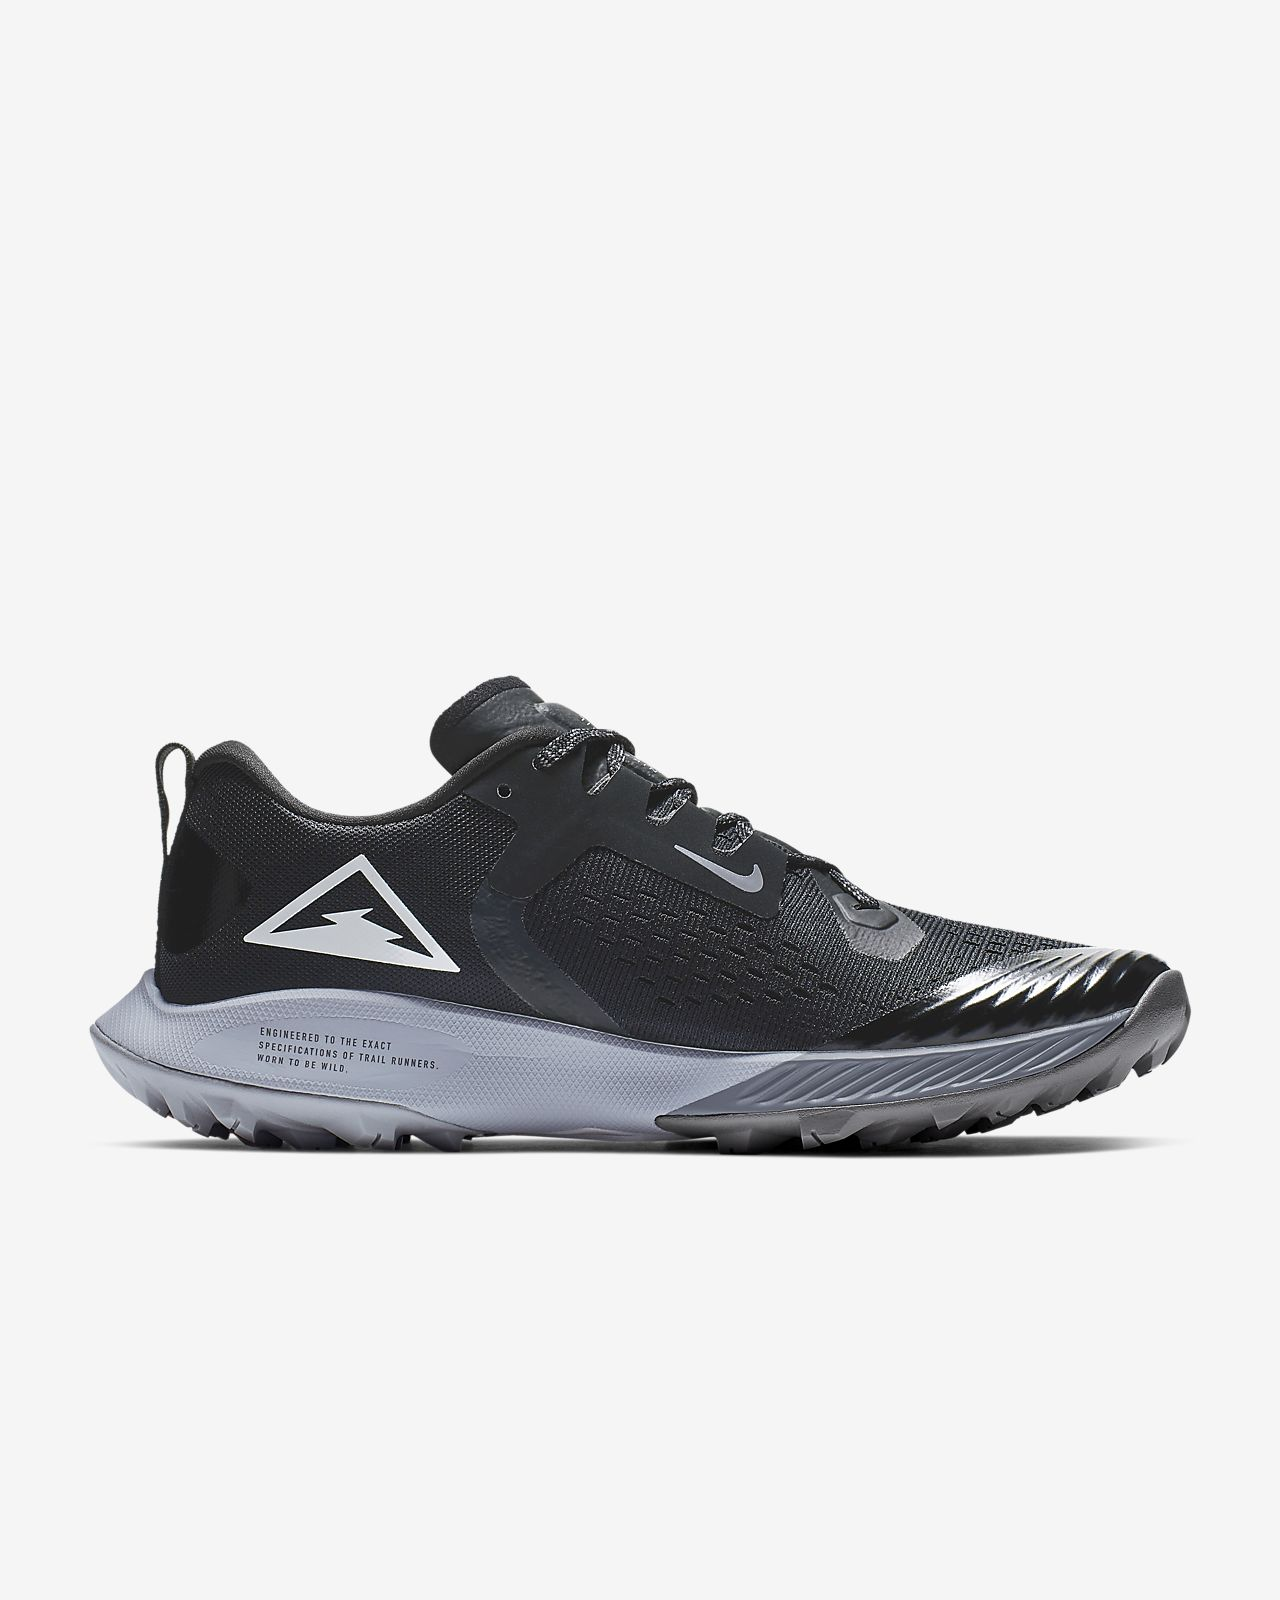 feedf611e Nike Air Zoom Terra Kiger 5 Zapatillas de running - Mujer. Nike.com ES